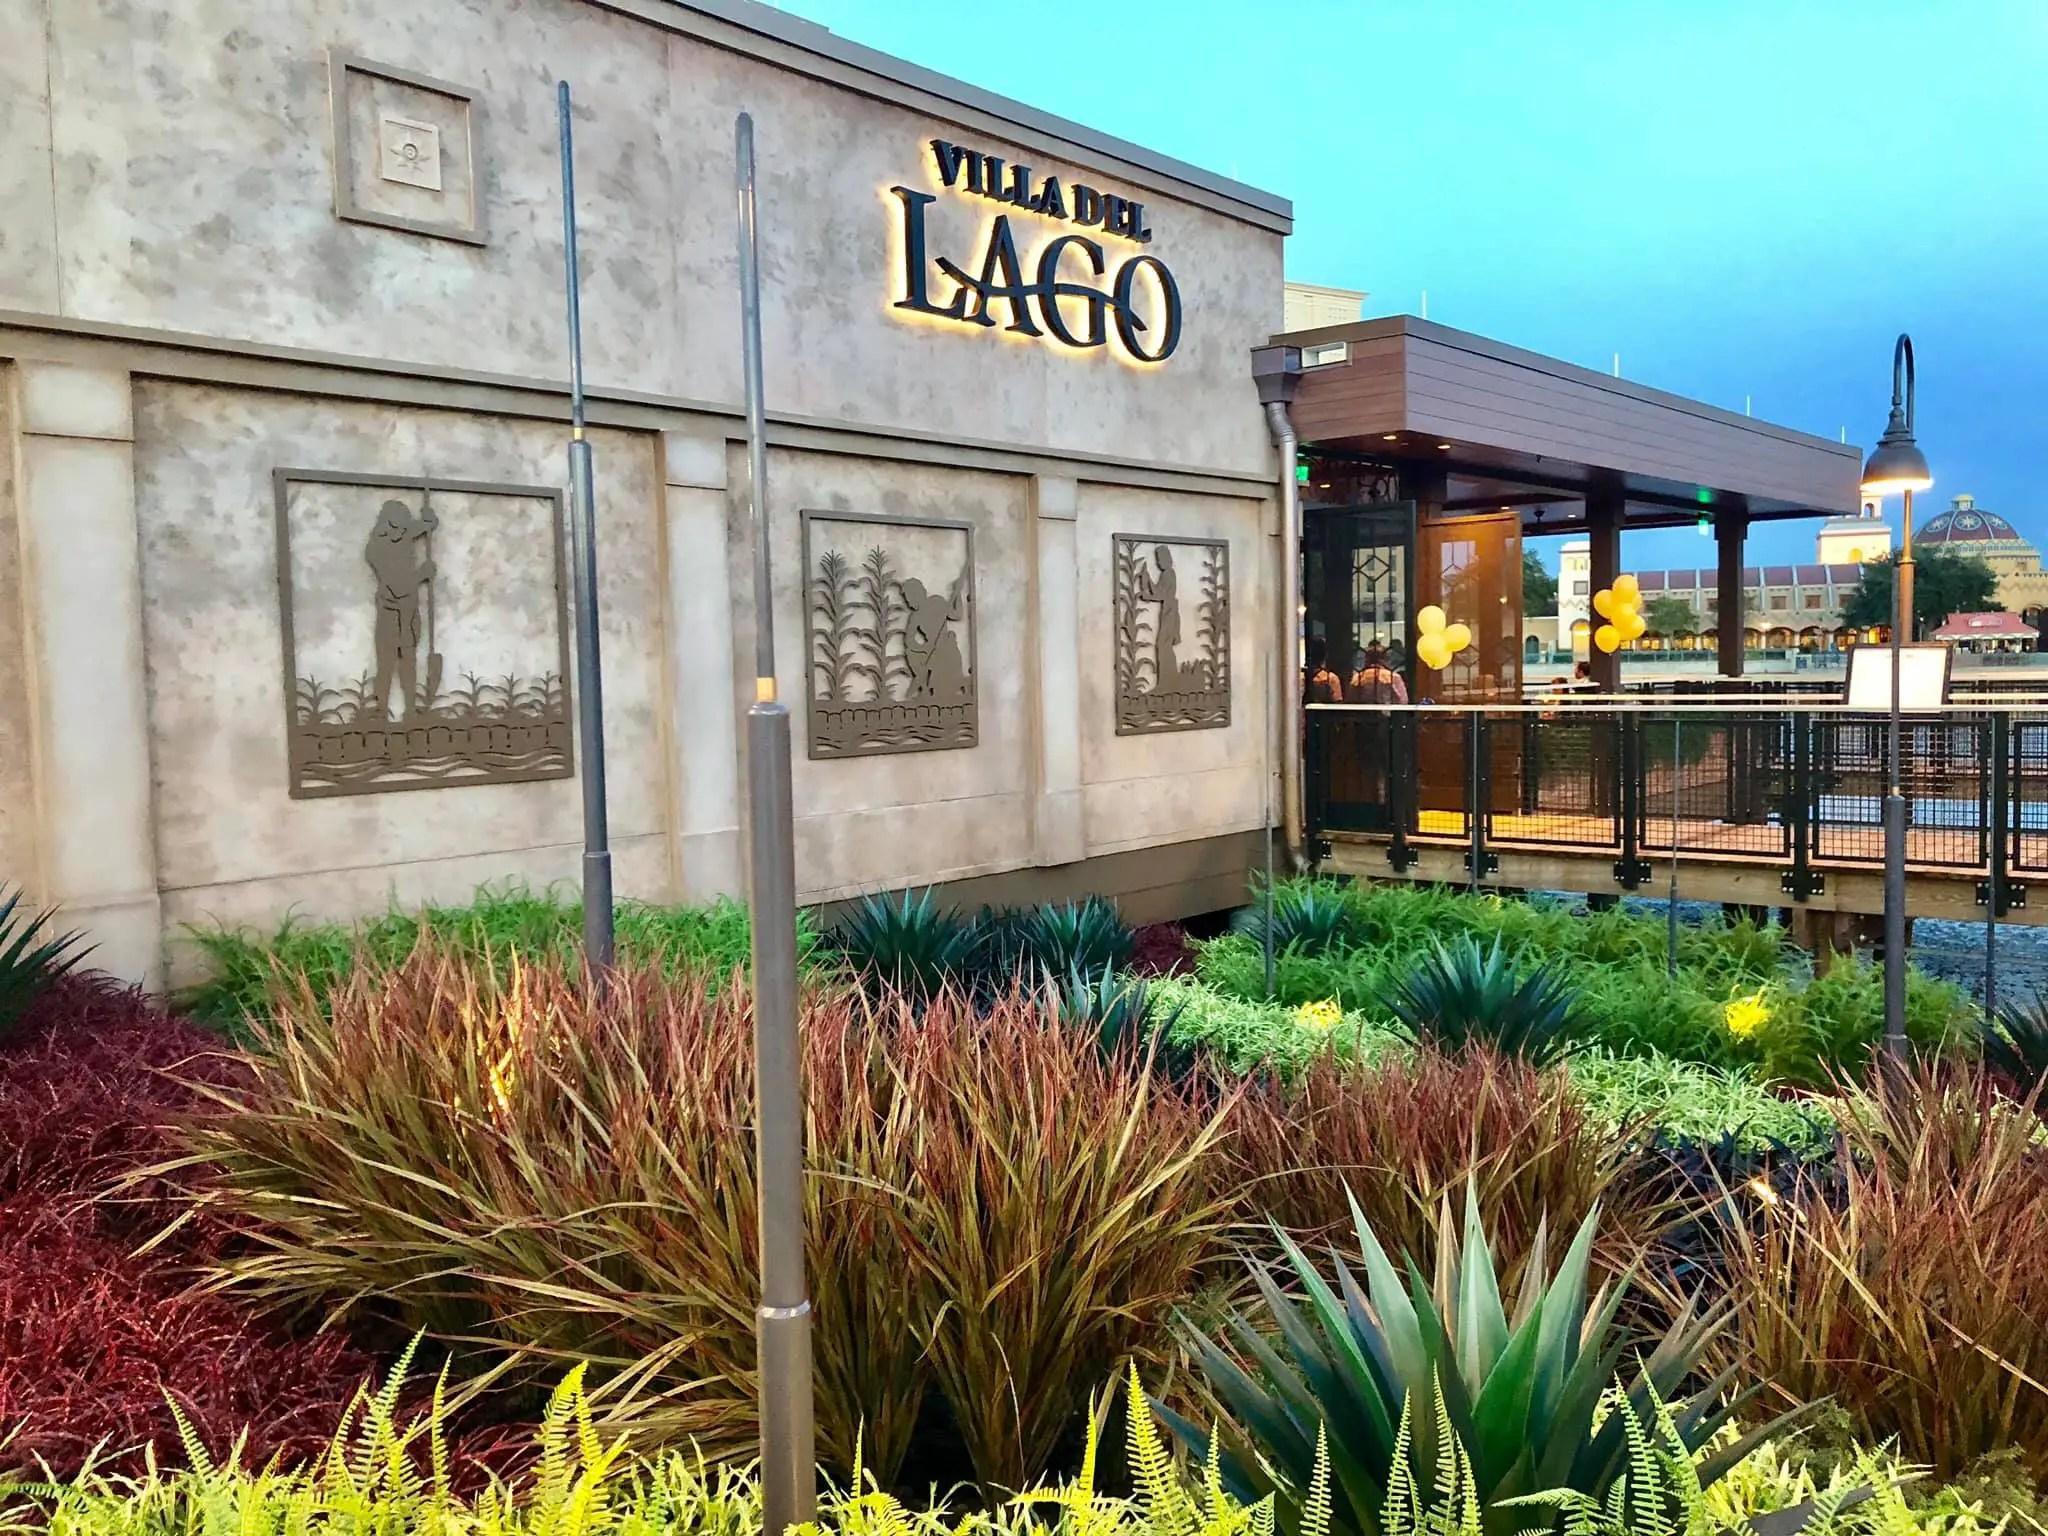 Villa Del Lago Soft Opening at Disney's Coronado Springs Resort 2